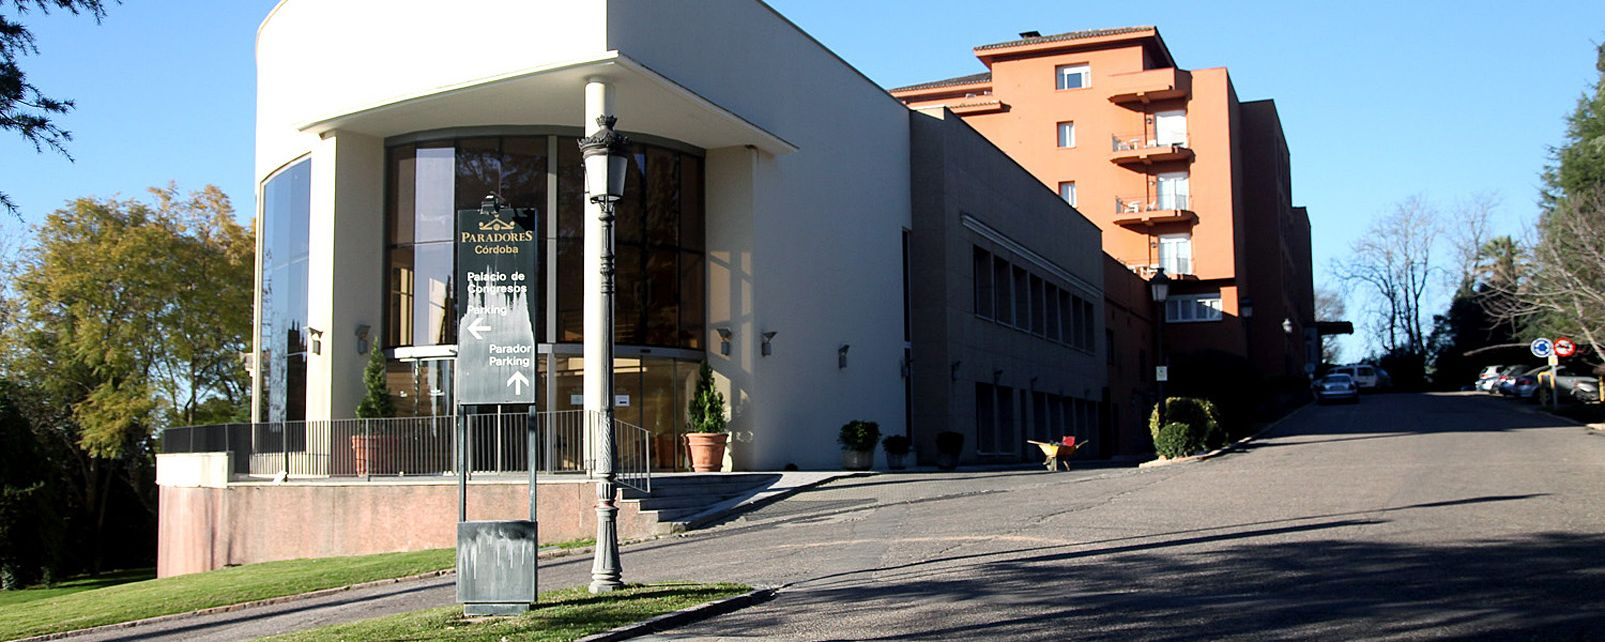 Hôtel Parador de Córdoba